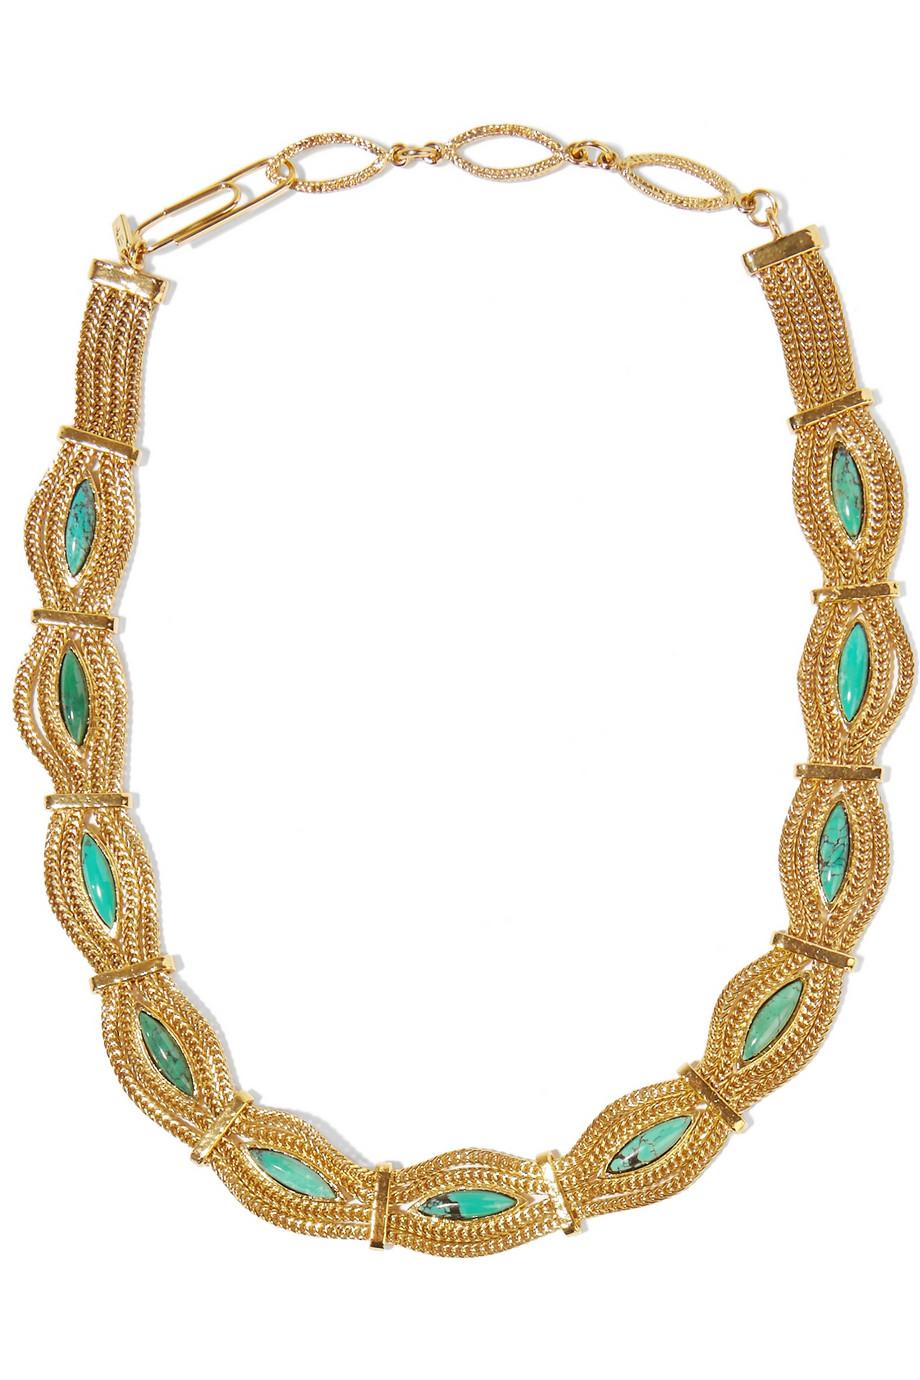 Aurelie bidermann Gold-plated Turquoise Necklace in ...